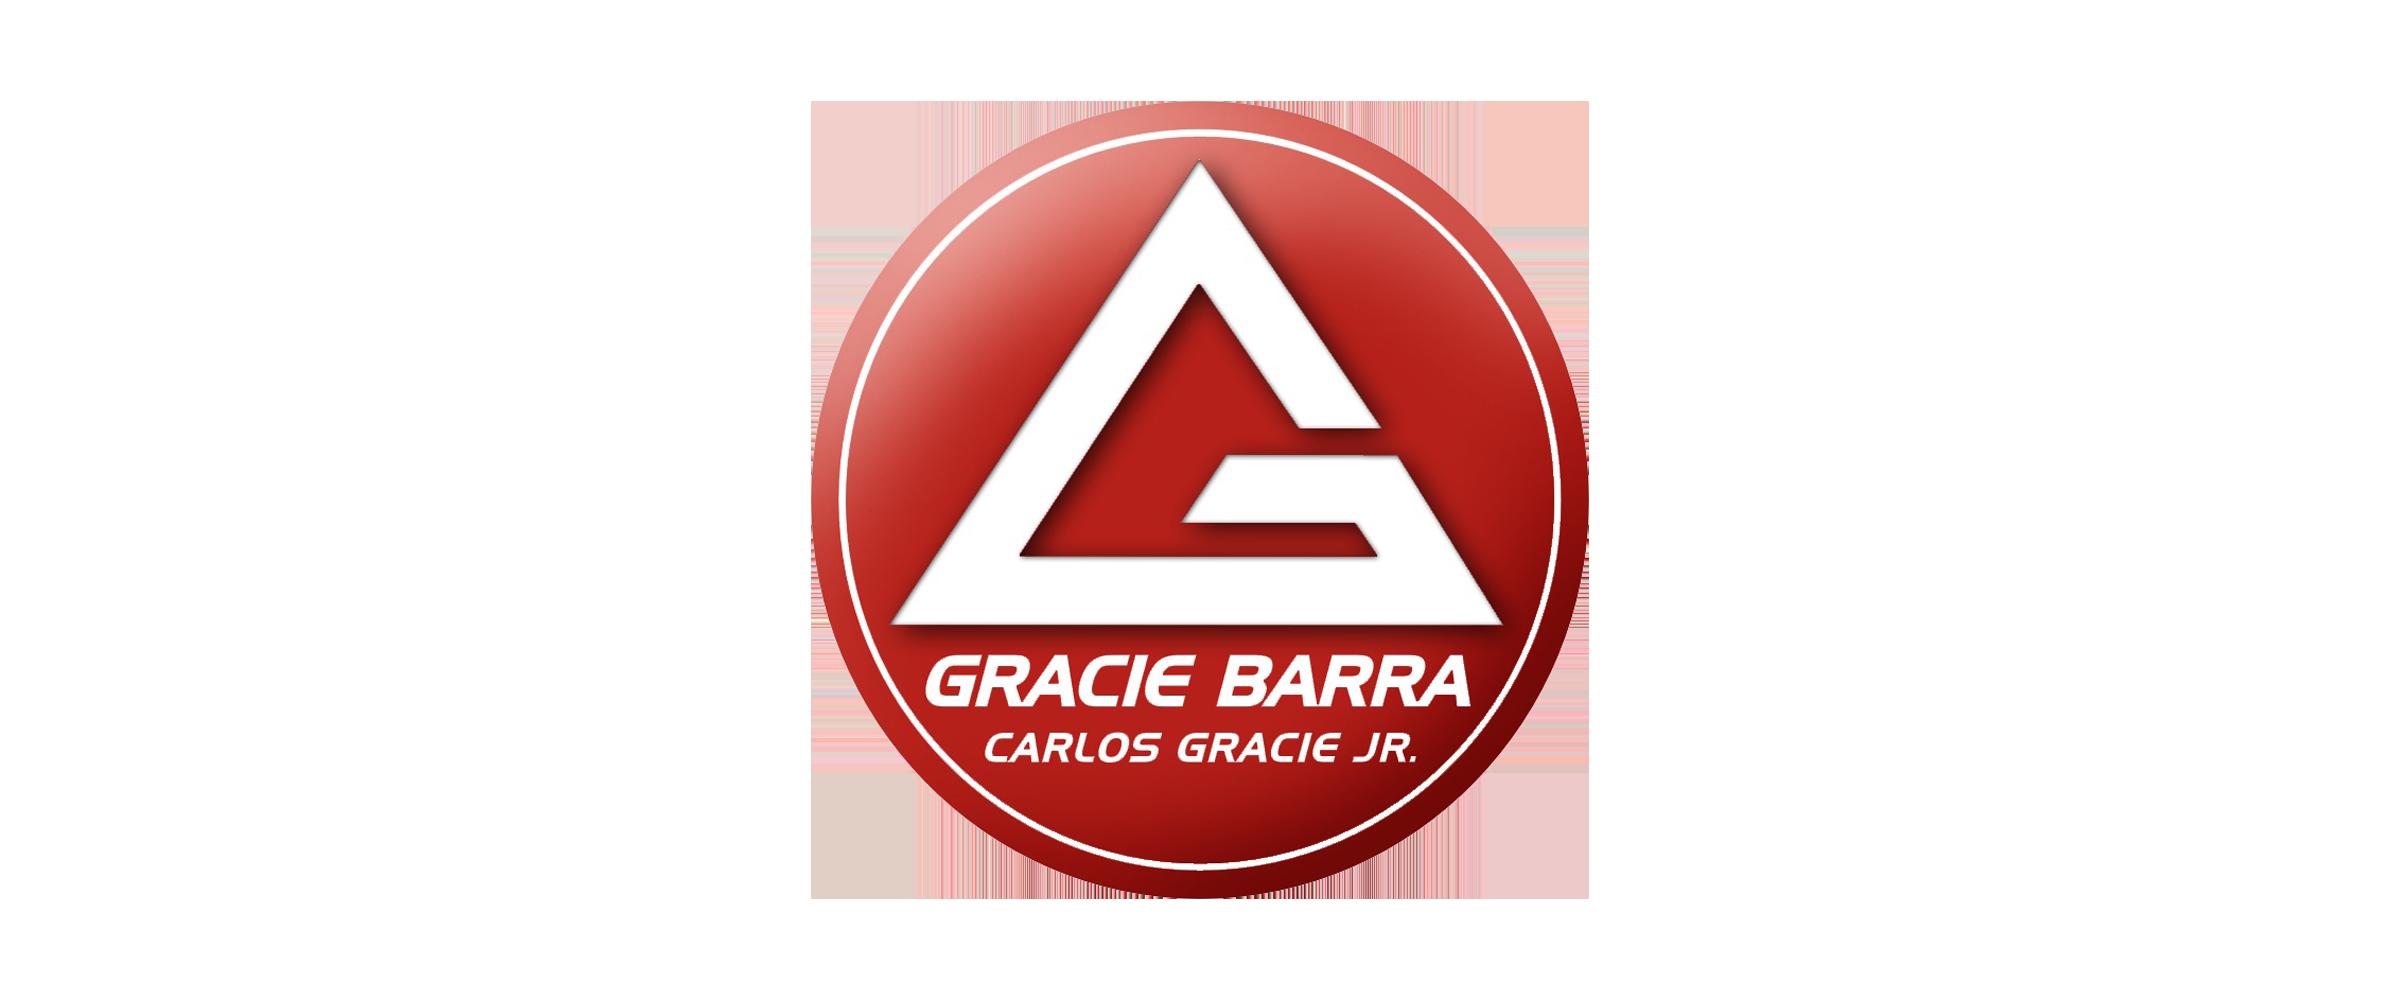 Gracie_Barra_Color_Frame